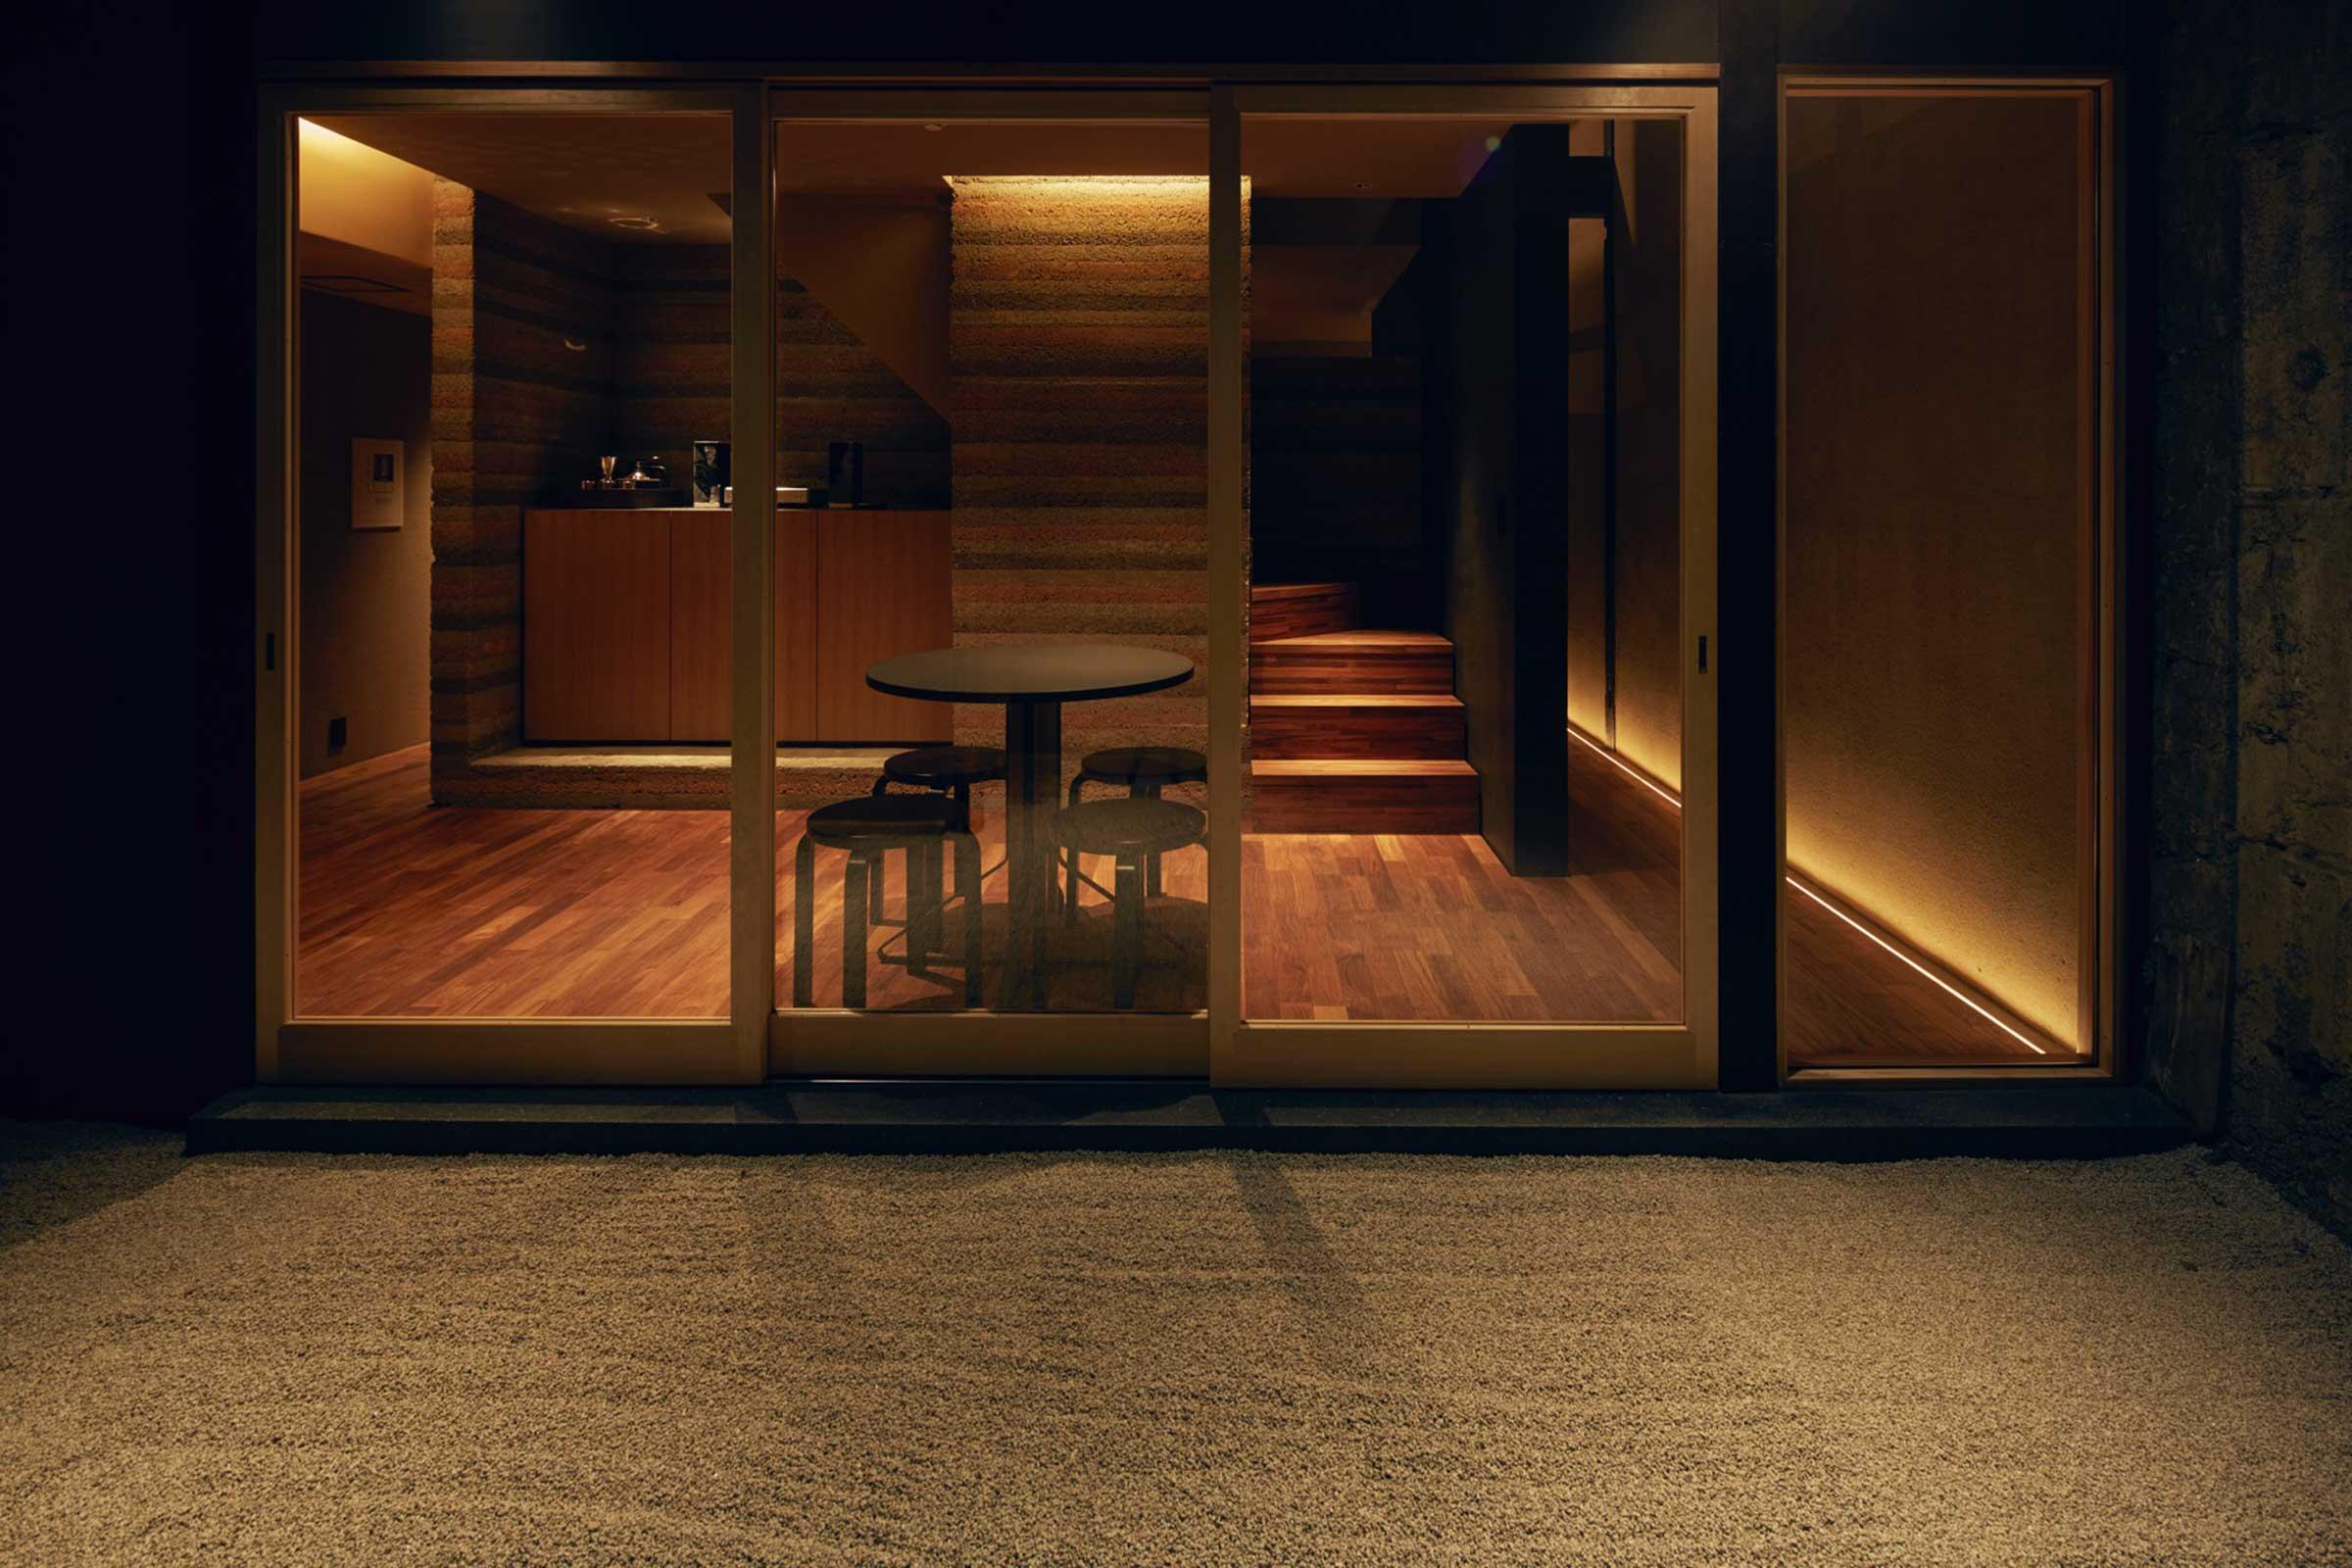 HOSOO Residence. Image courtesy of HOSOO Residence